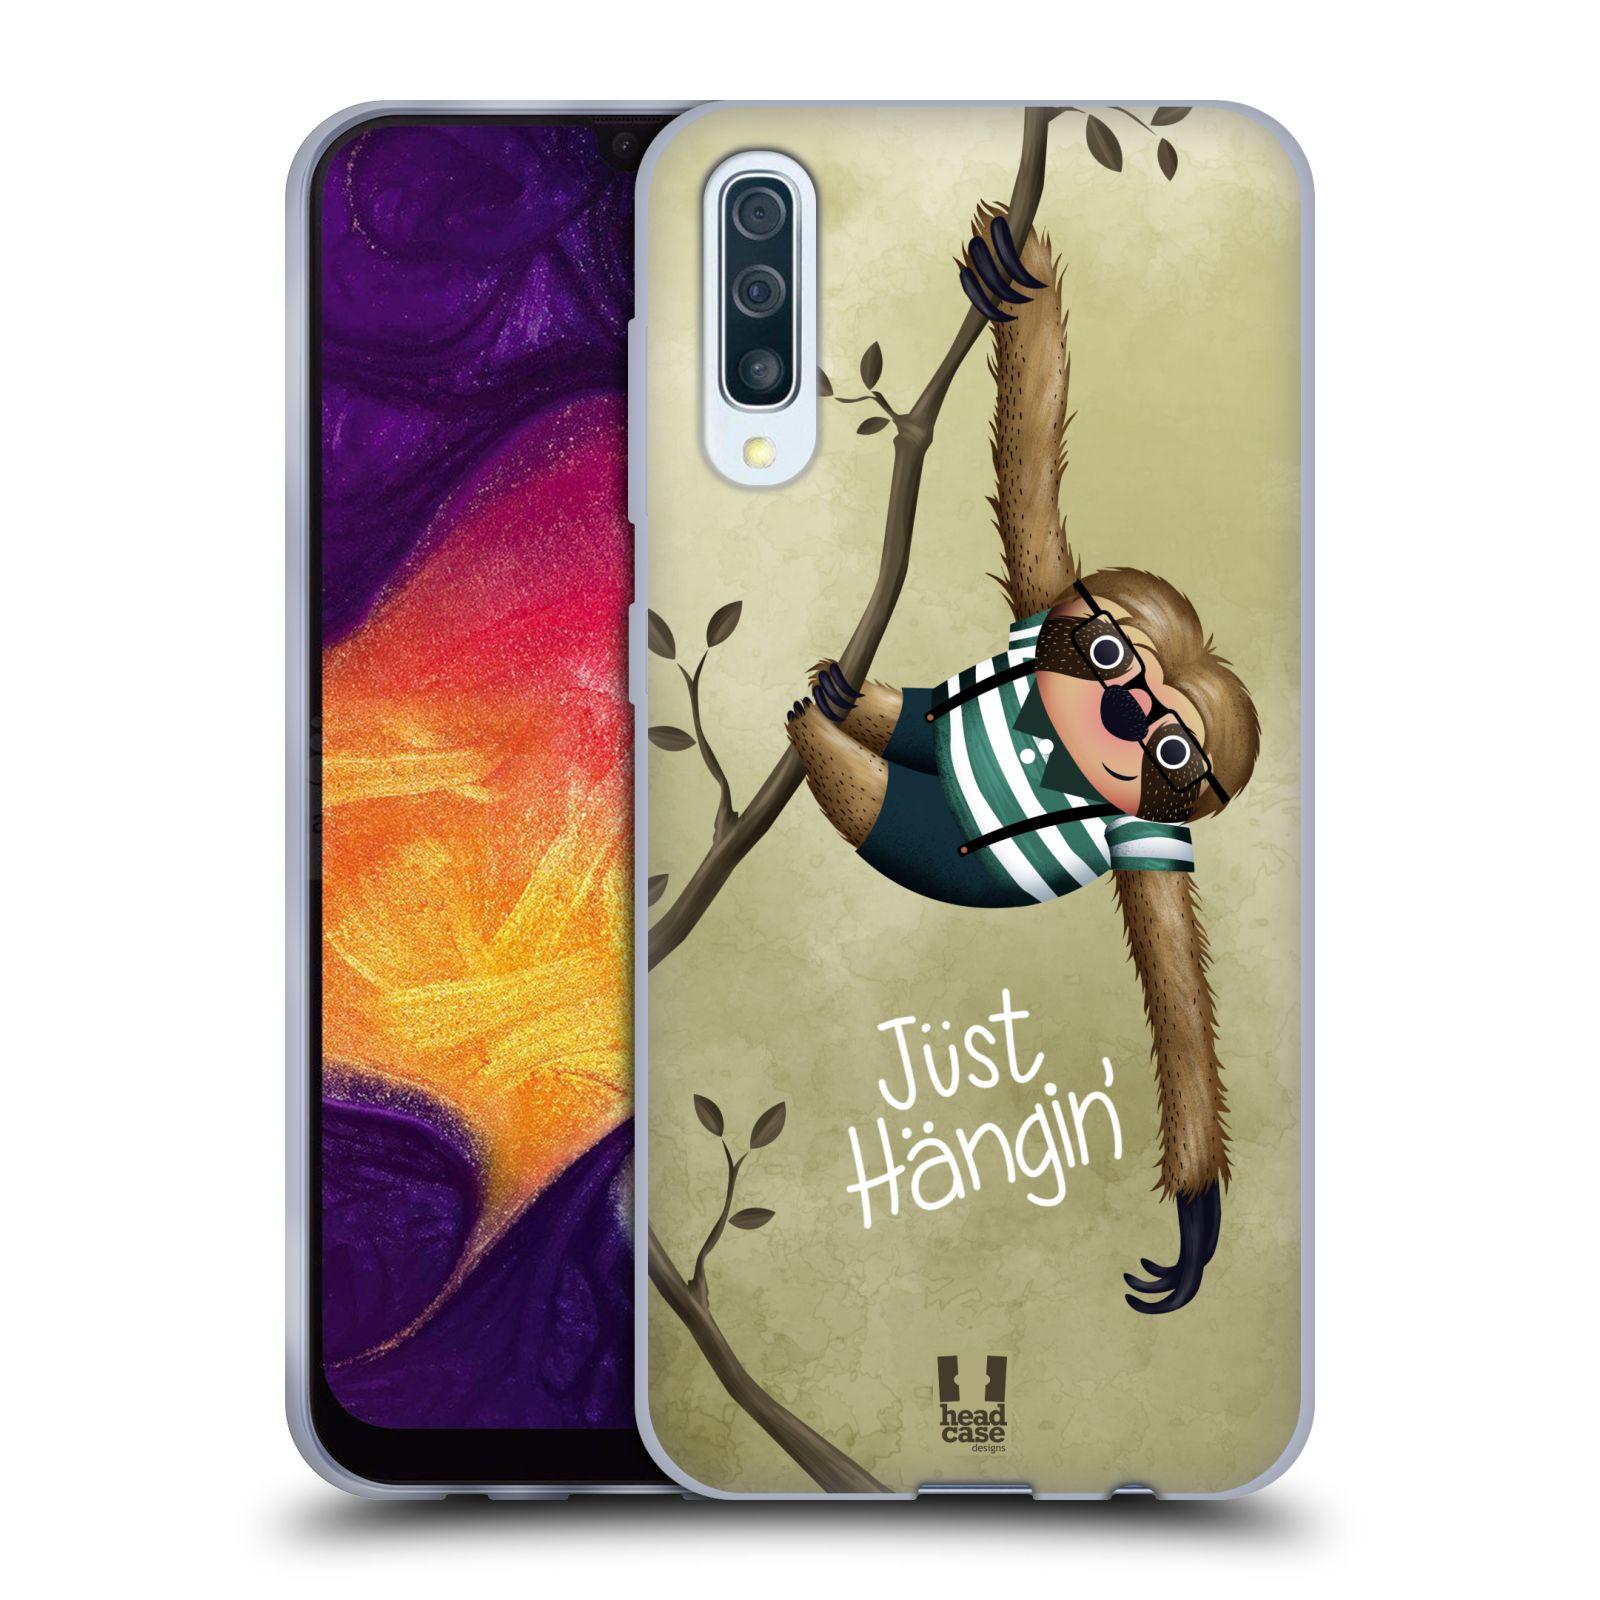 Silikonové pouzdro na mobil Samsung Galaxy A50 / A30s - Head Case - Lenochod Just Hangin